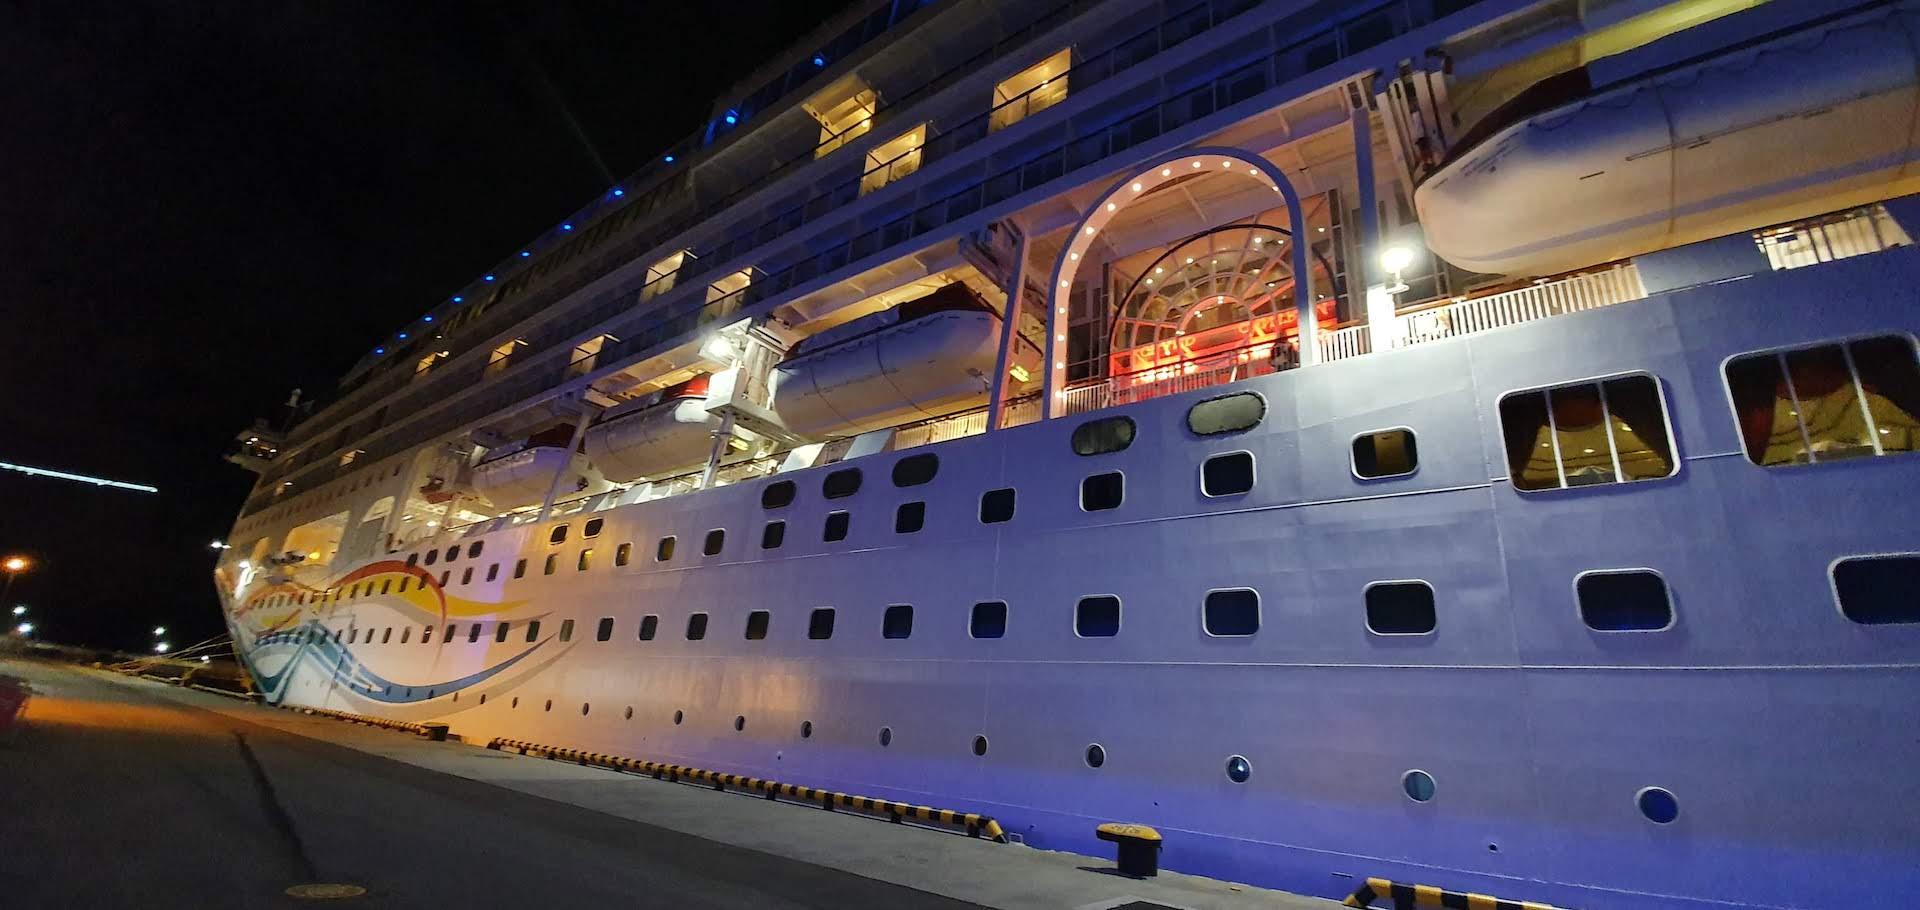 Norwegian Spirit fondeado en el puerto de San Petersburgo de Noche